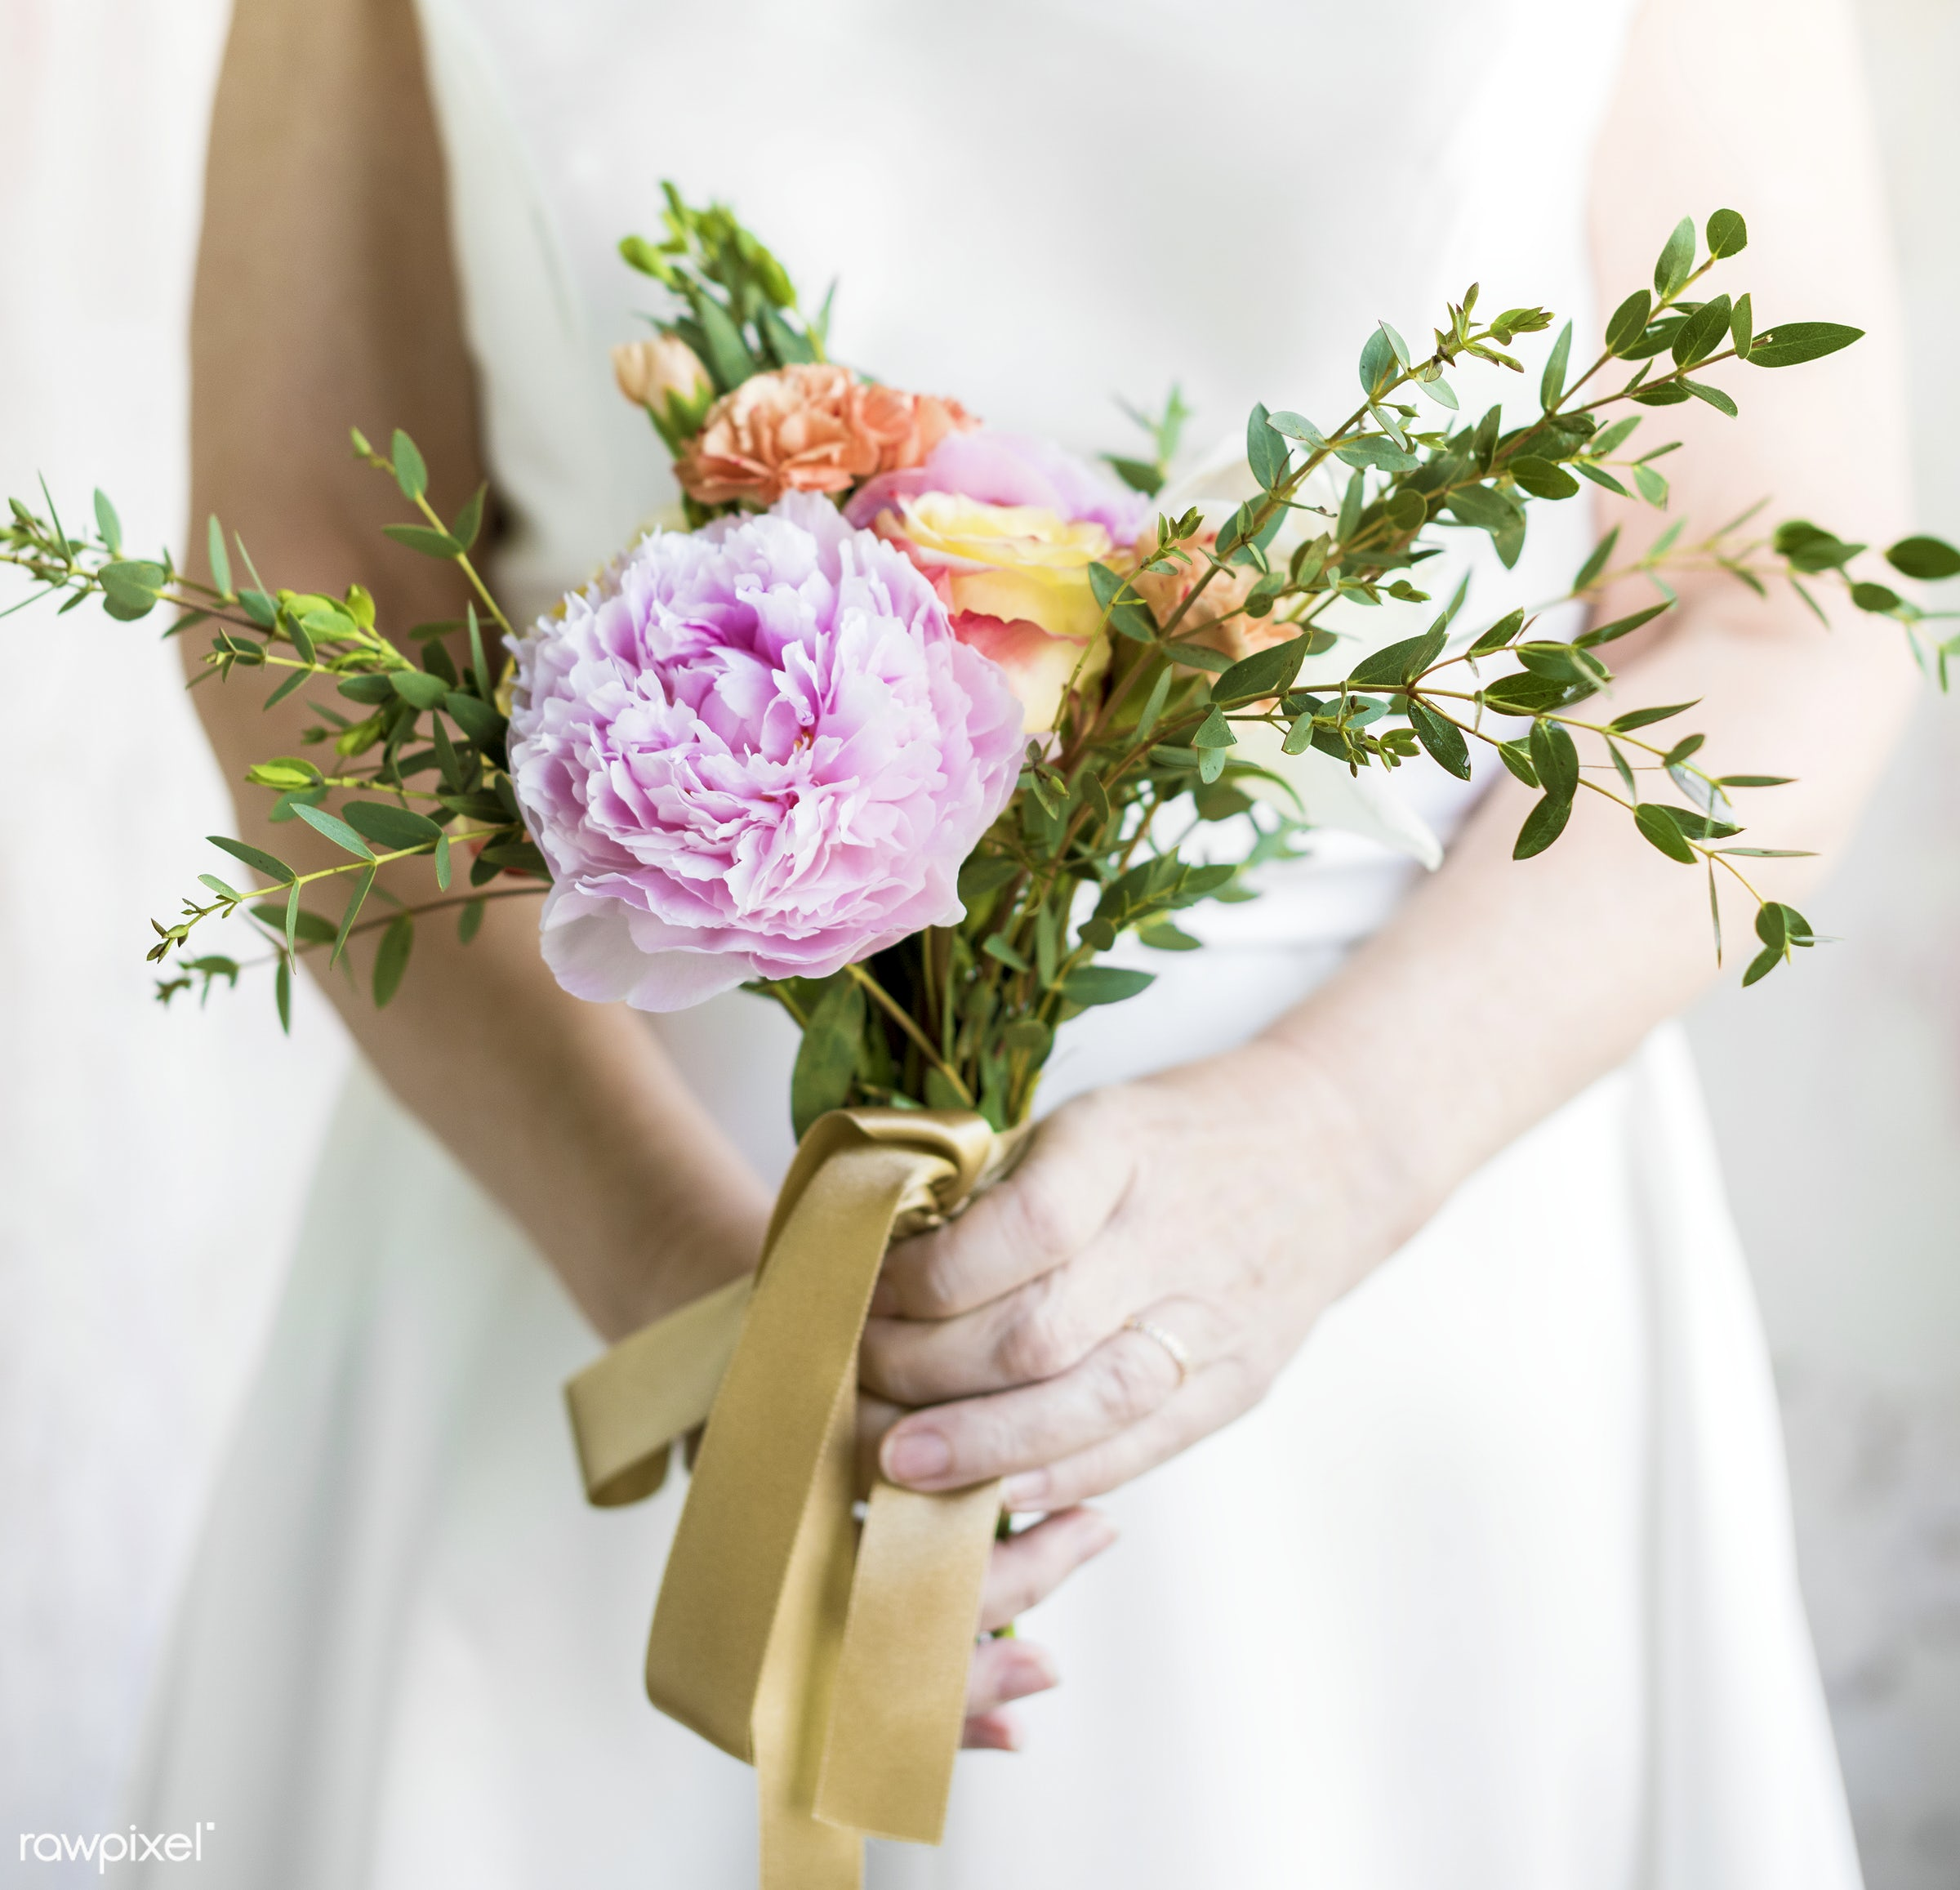 Bride holding a simple bouquet of flower - hands, body, closeup, flowers, leave, bouquet, simple, holding, bride, gown,...